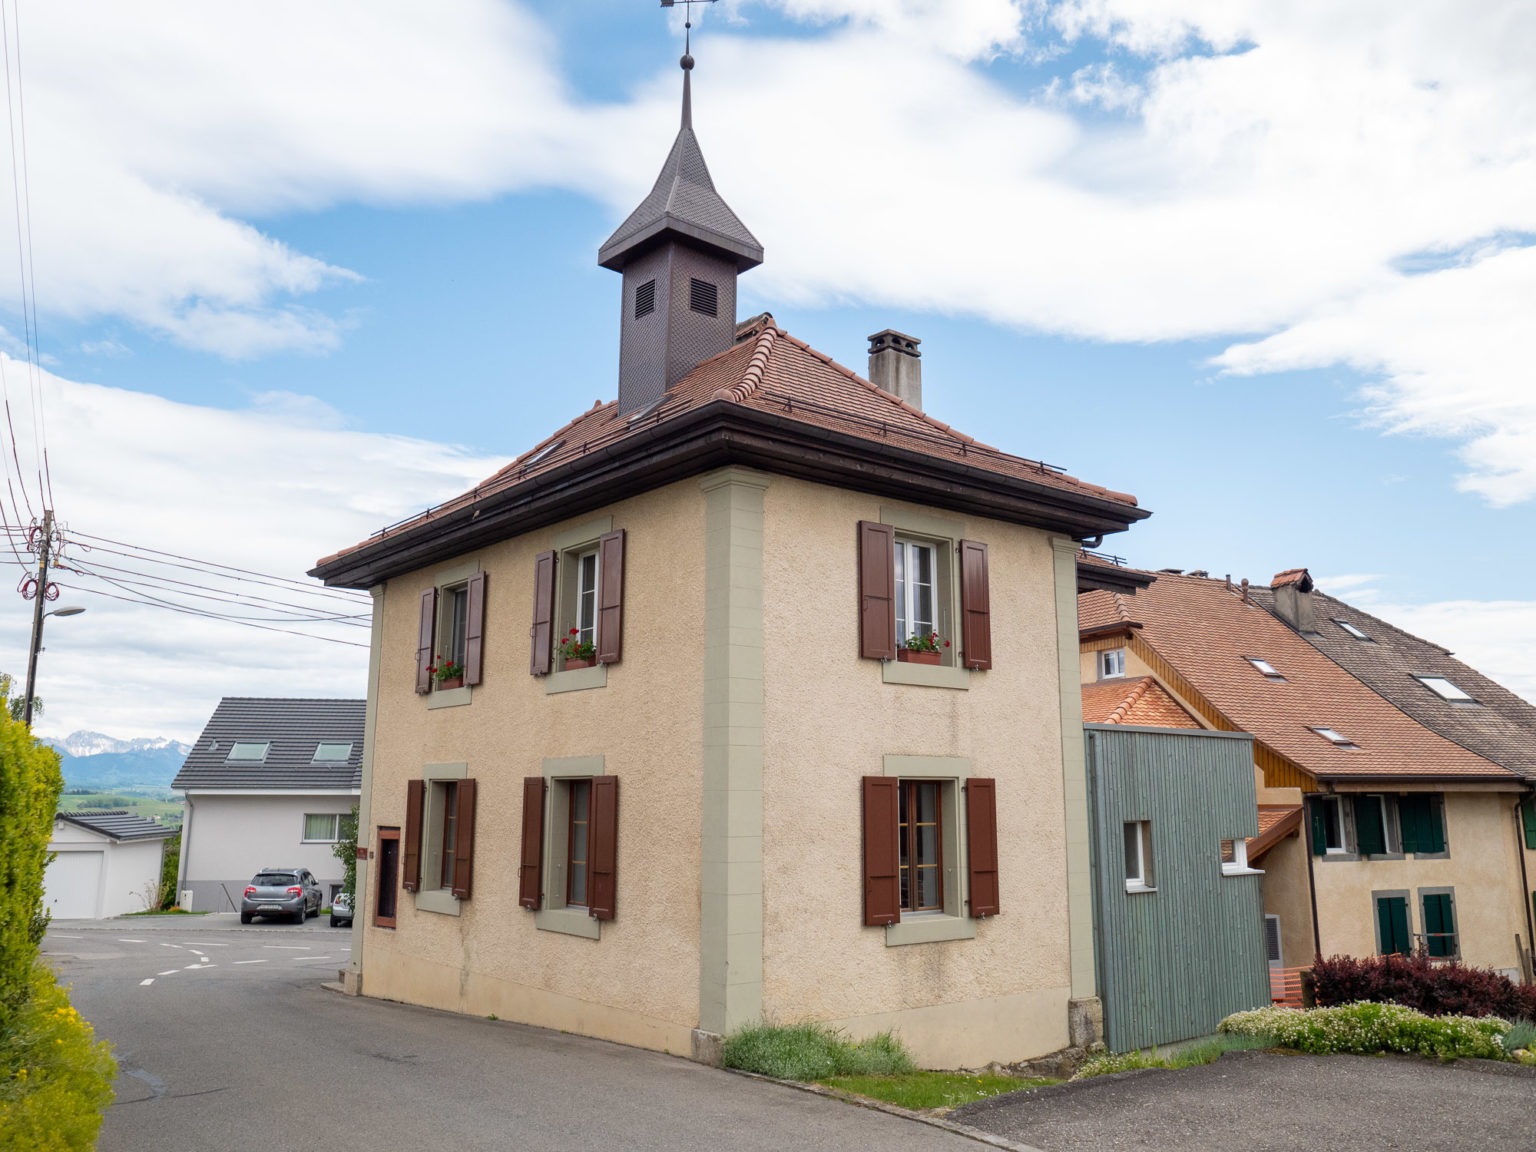 Refuges-salles-Montanaire_MAINIMAGE-©V-Dubach-52723